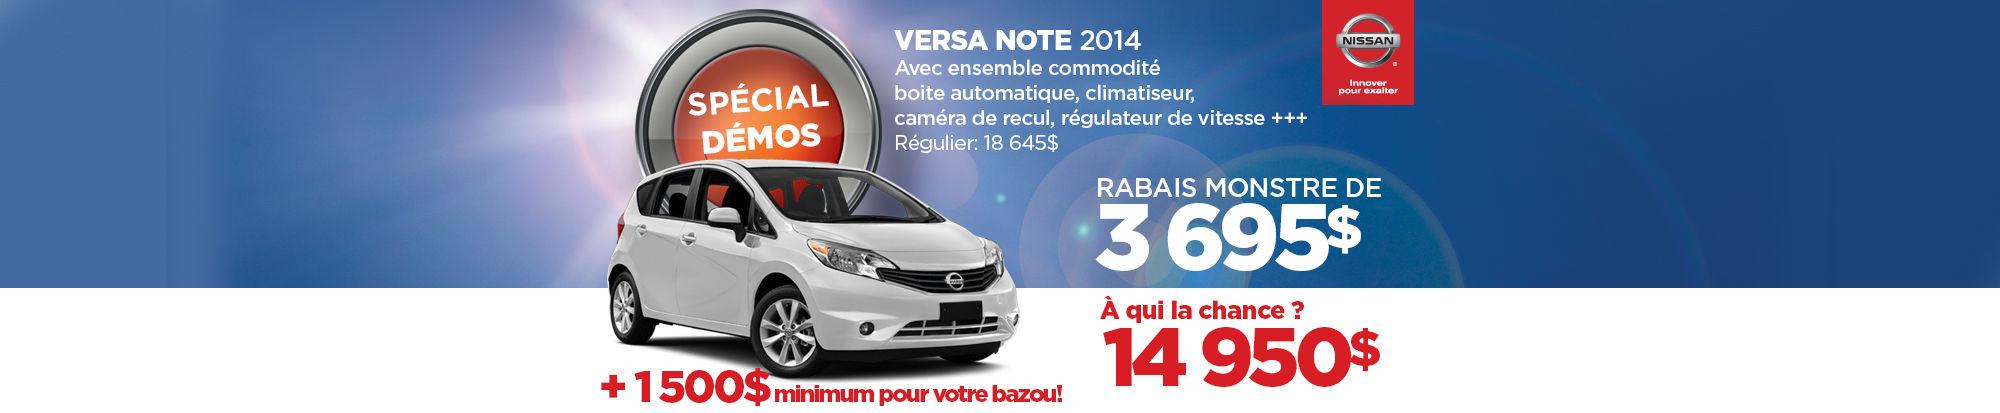 La Nissan Versa Note démo 2014